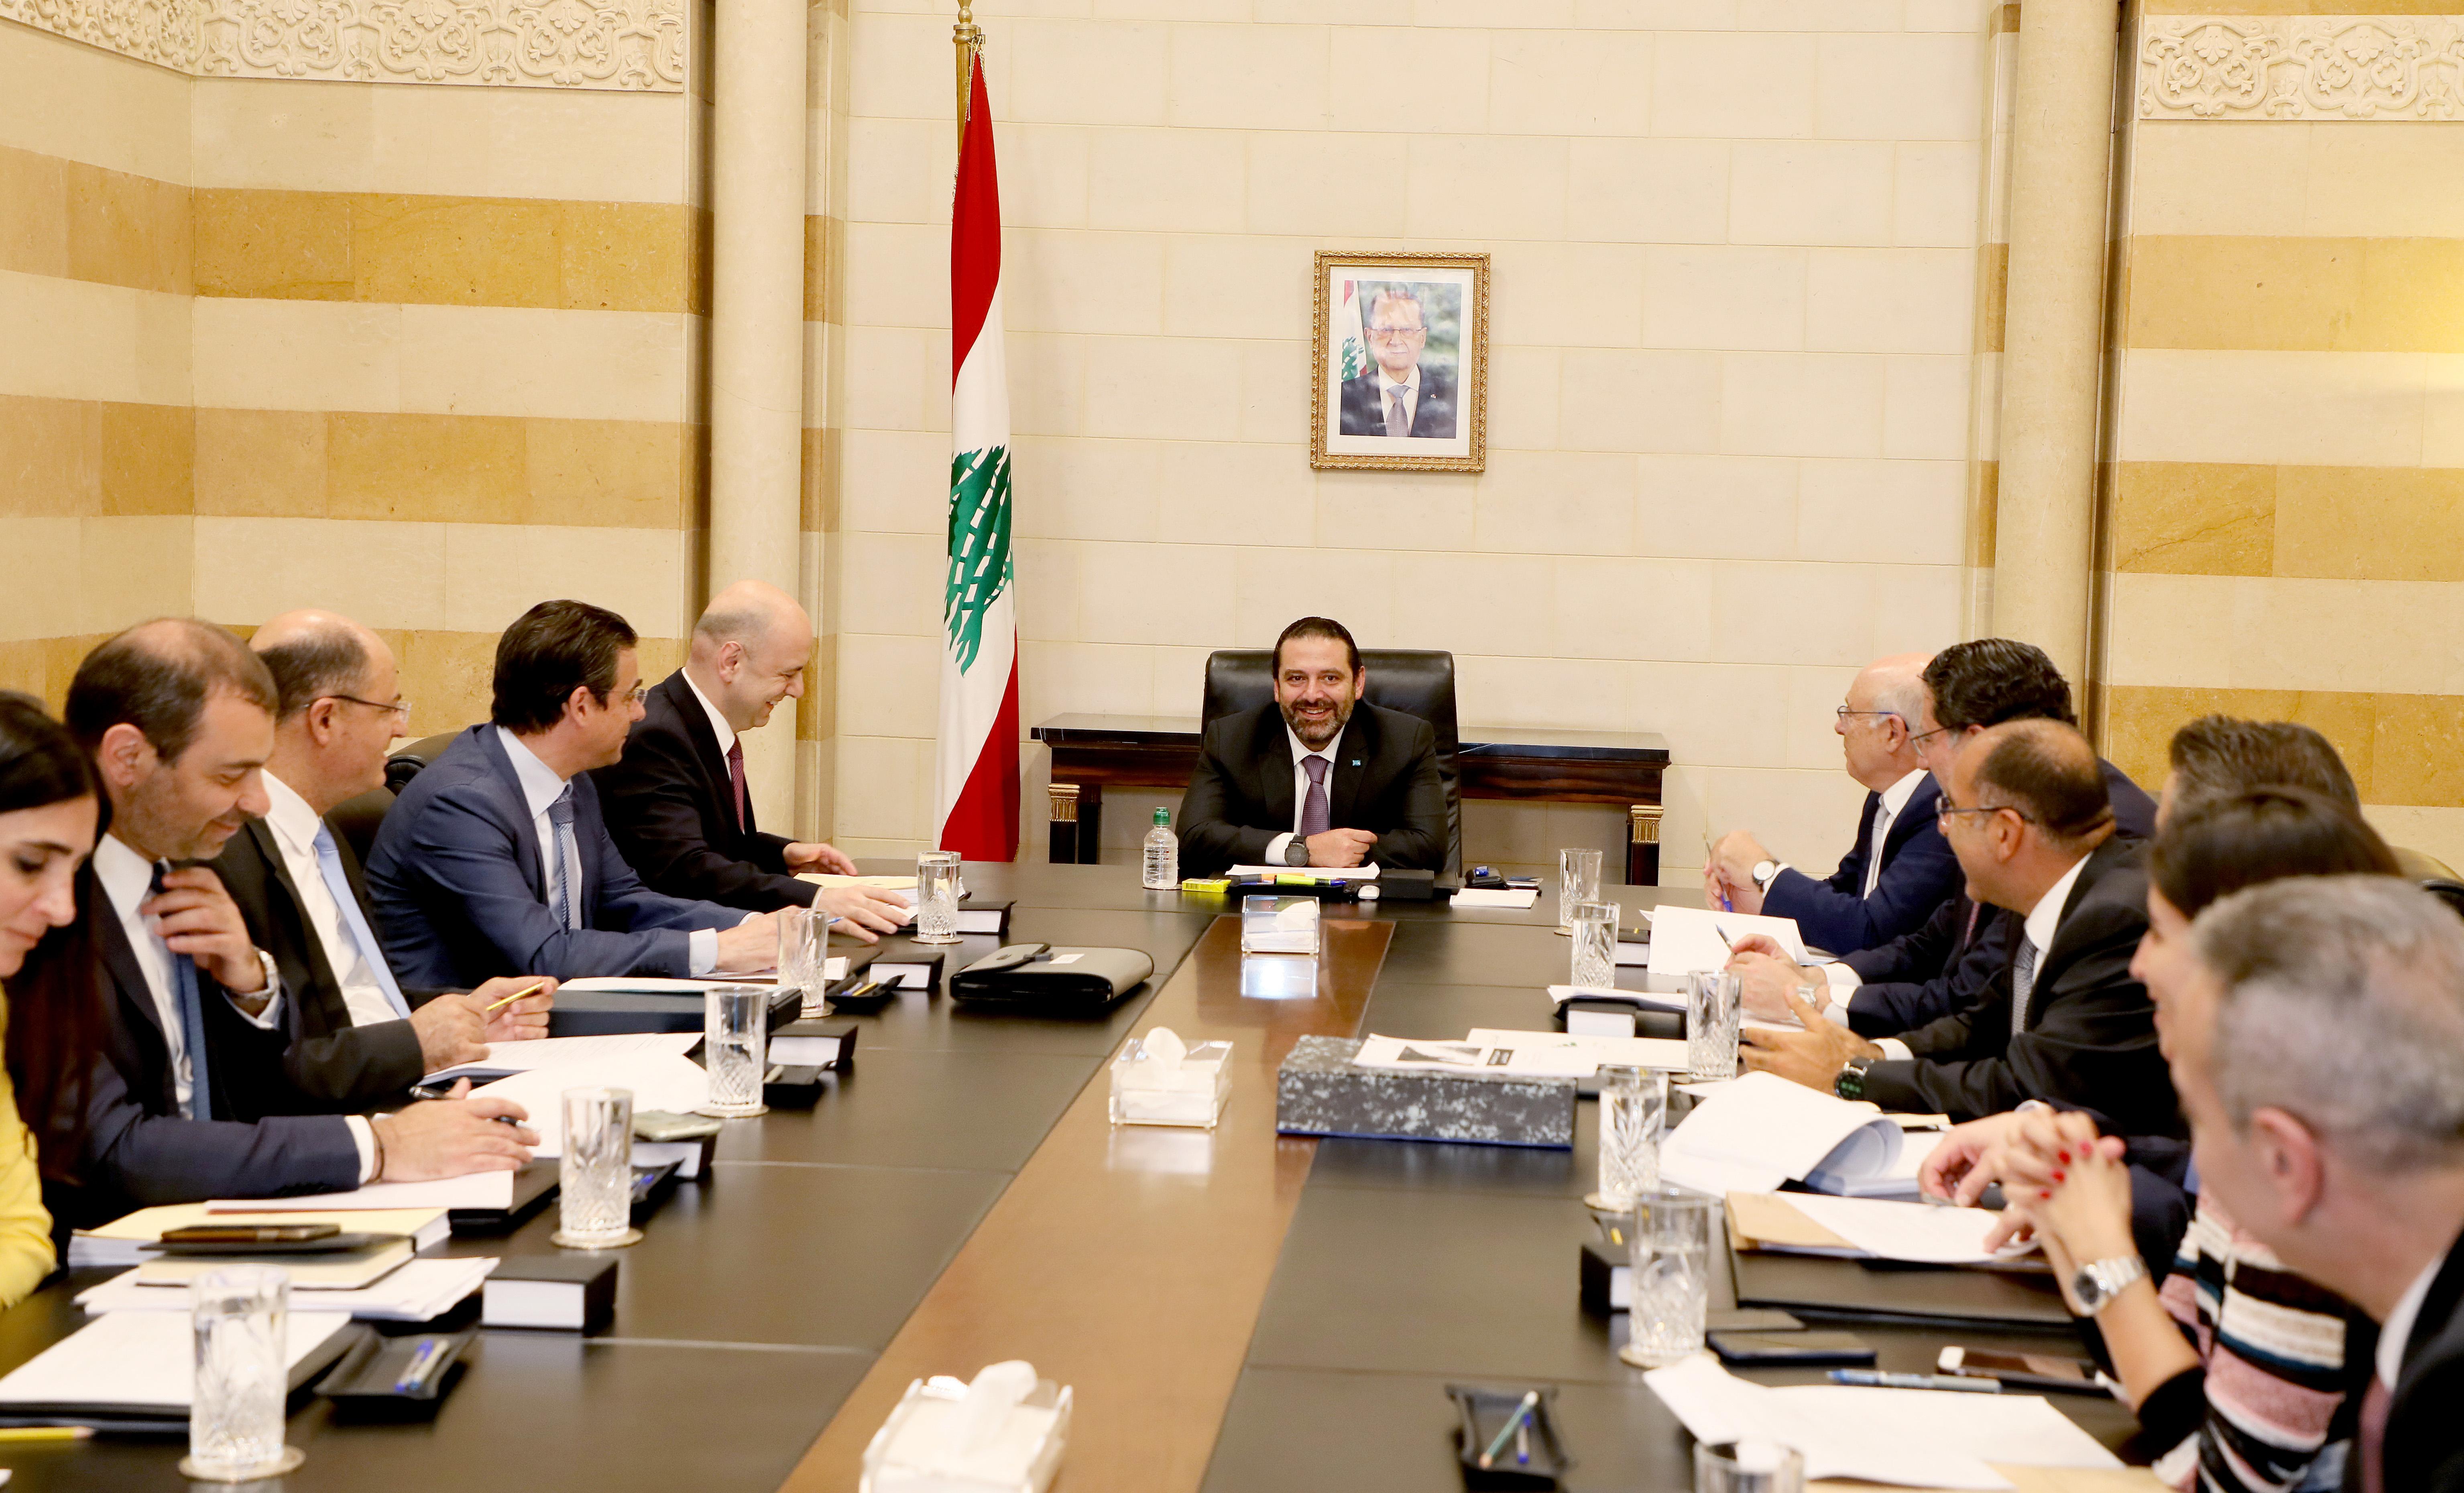 Pr Minister Saad Hariri Heading a Telecomunication Committee